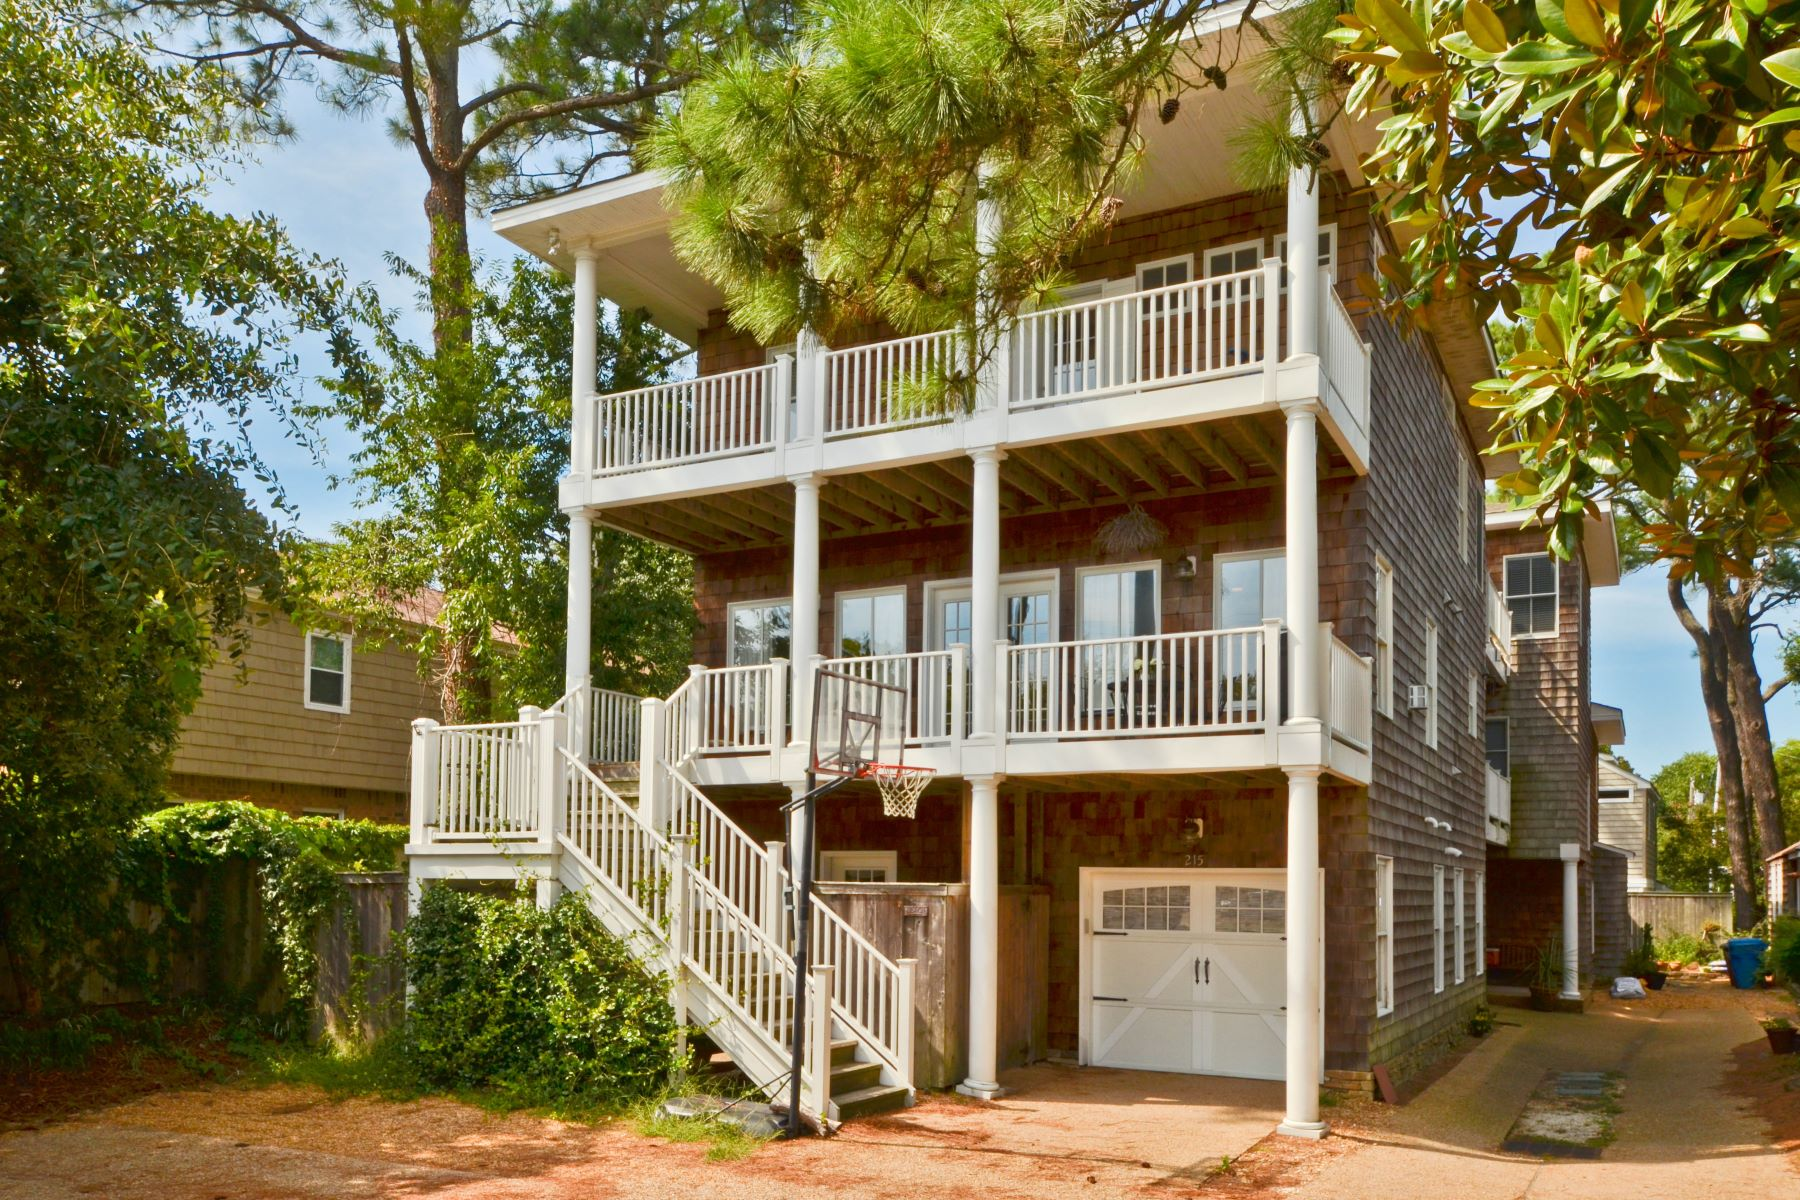 Condominium for Sale at Northend VB 215 83rd Street Unit# A Virginia Beach, Virginia 23451 United States